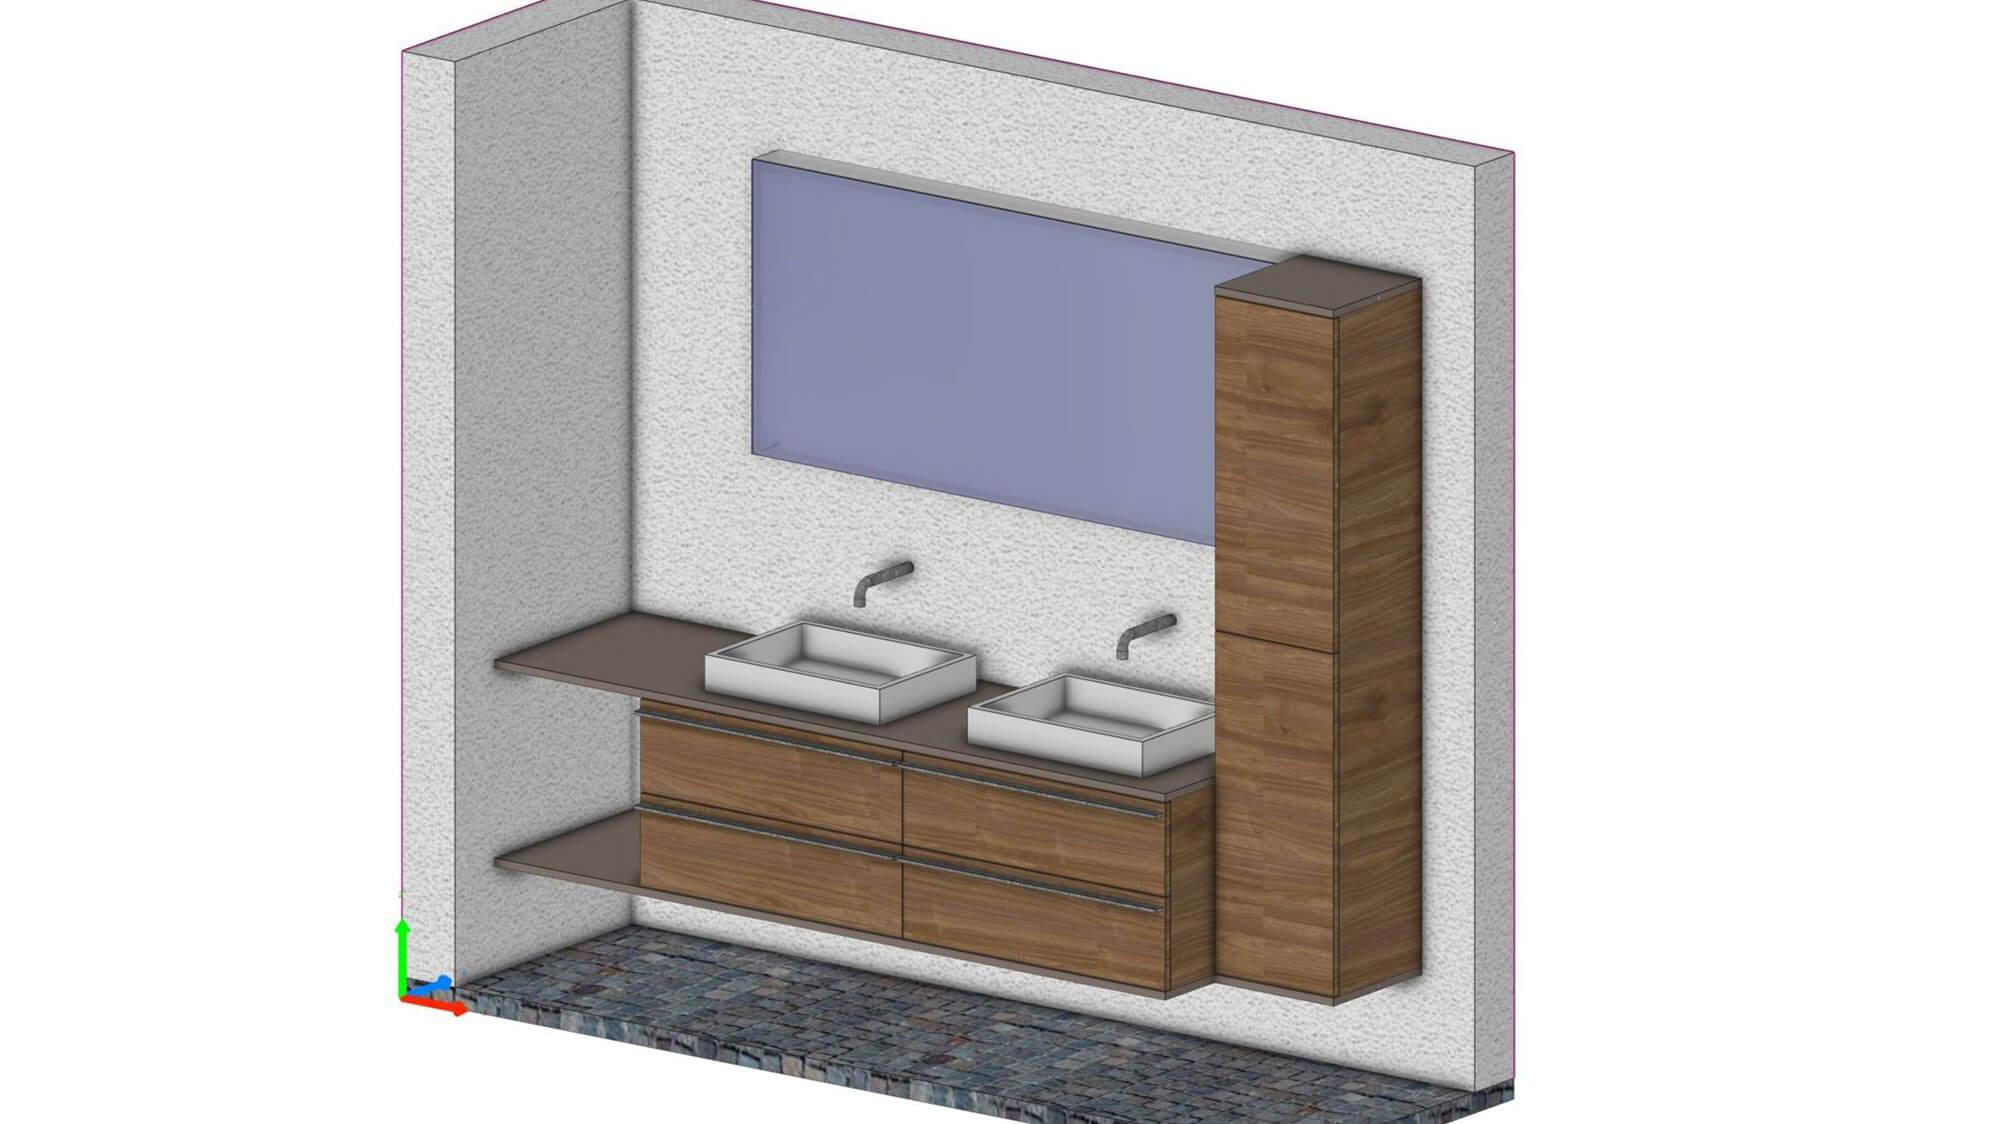 Eilinger-Holz-Visualisierung